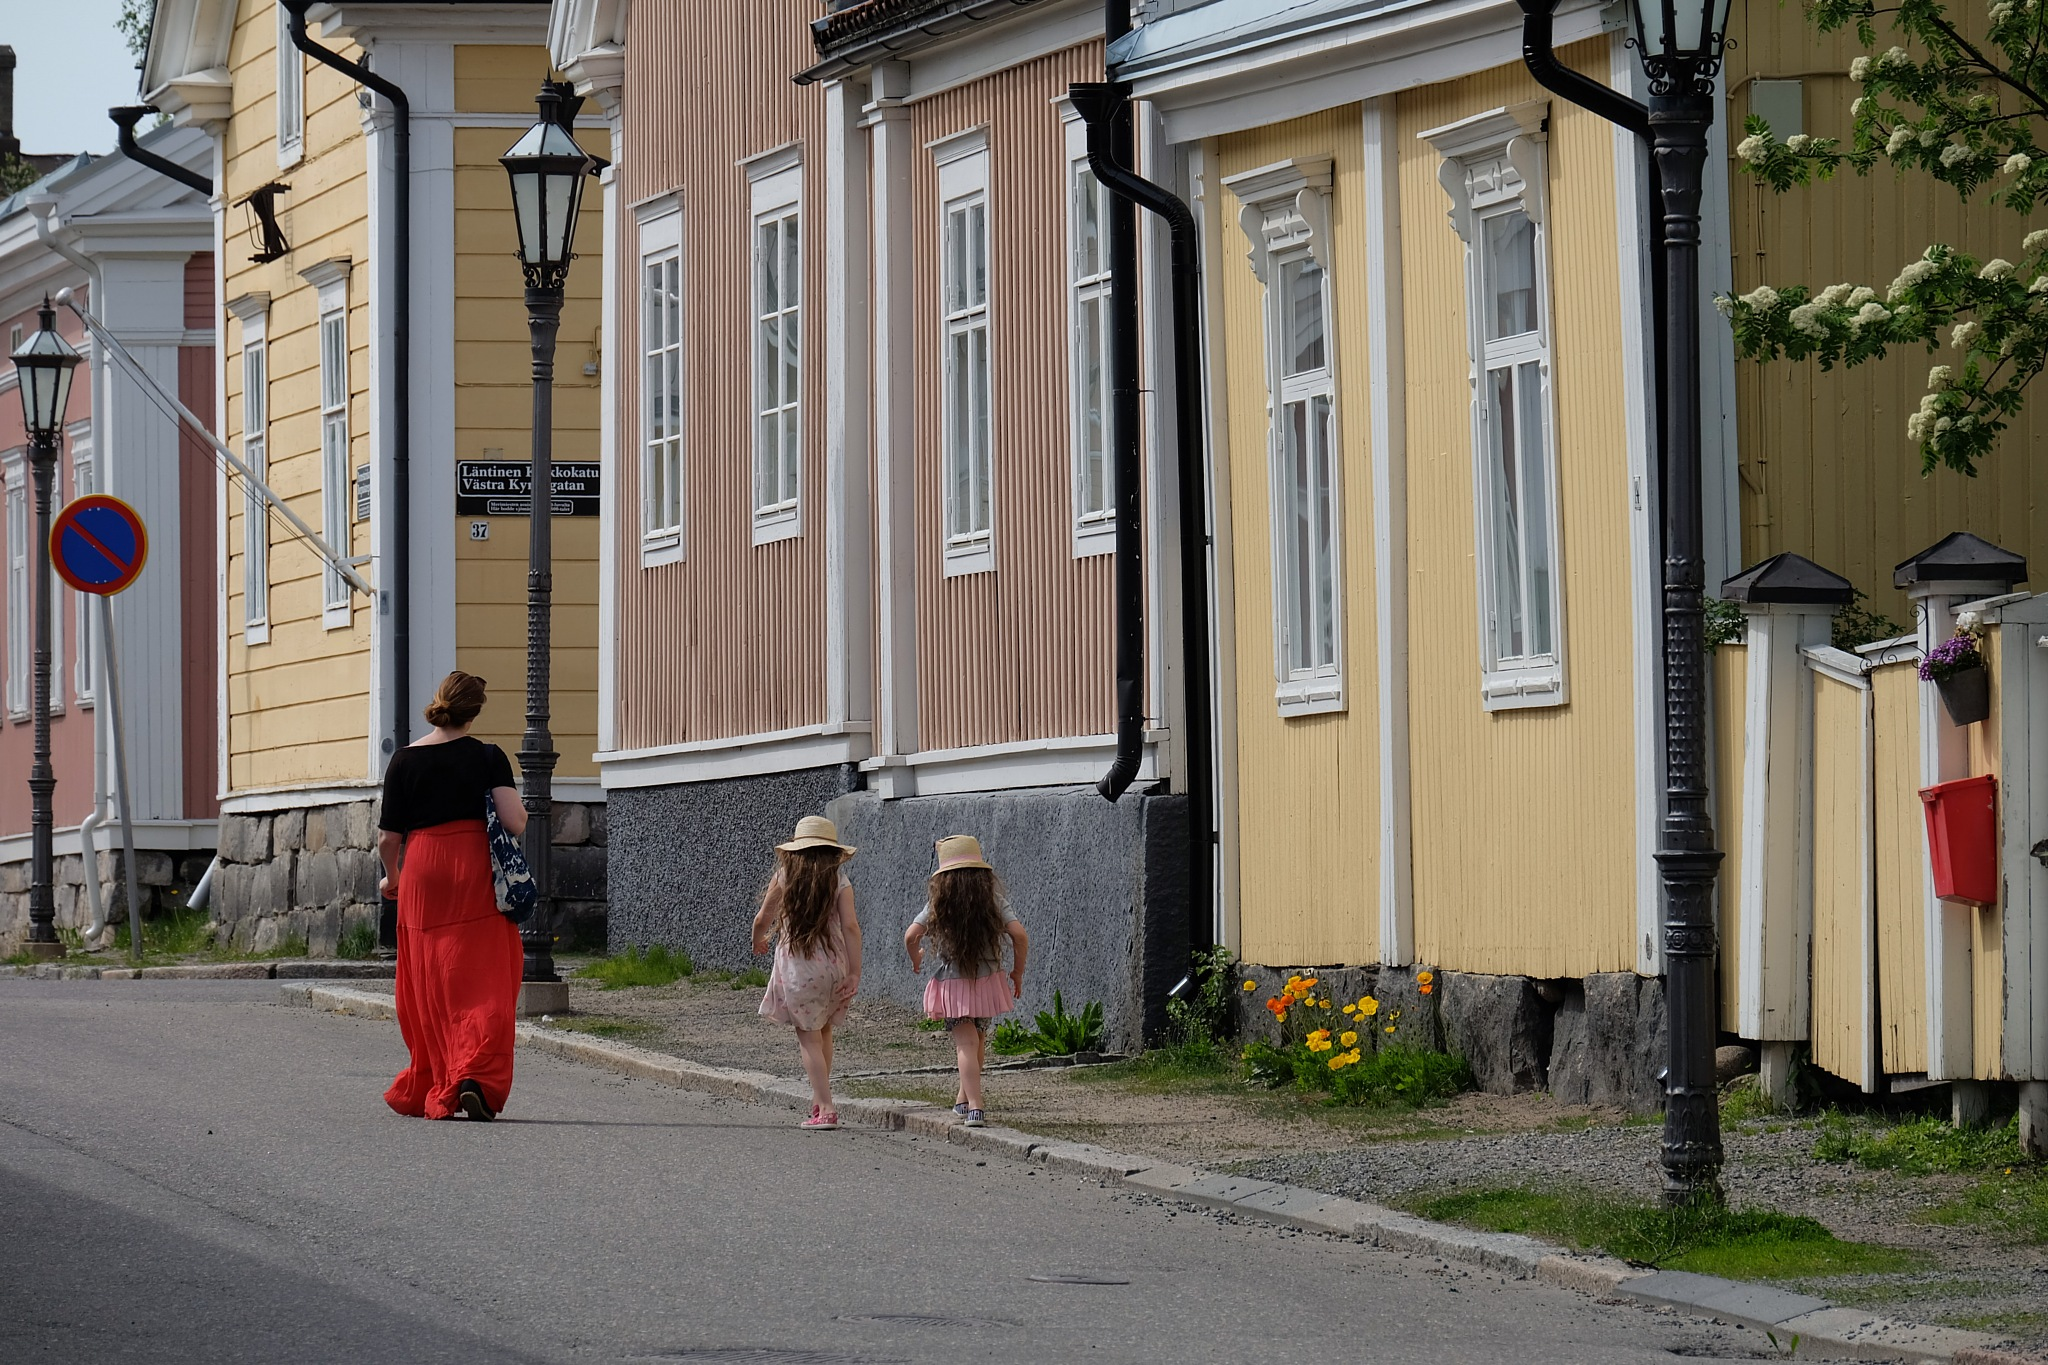 walk the line by Petri Mustonen